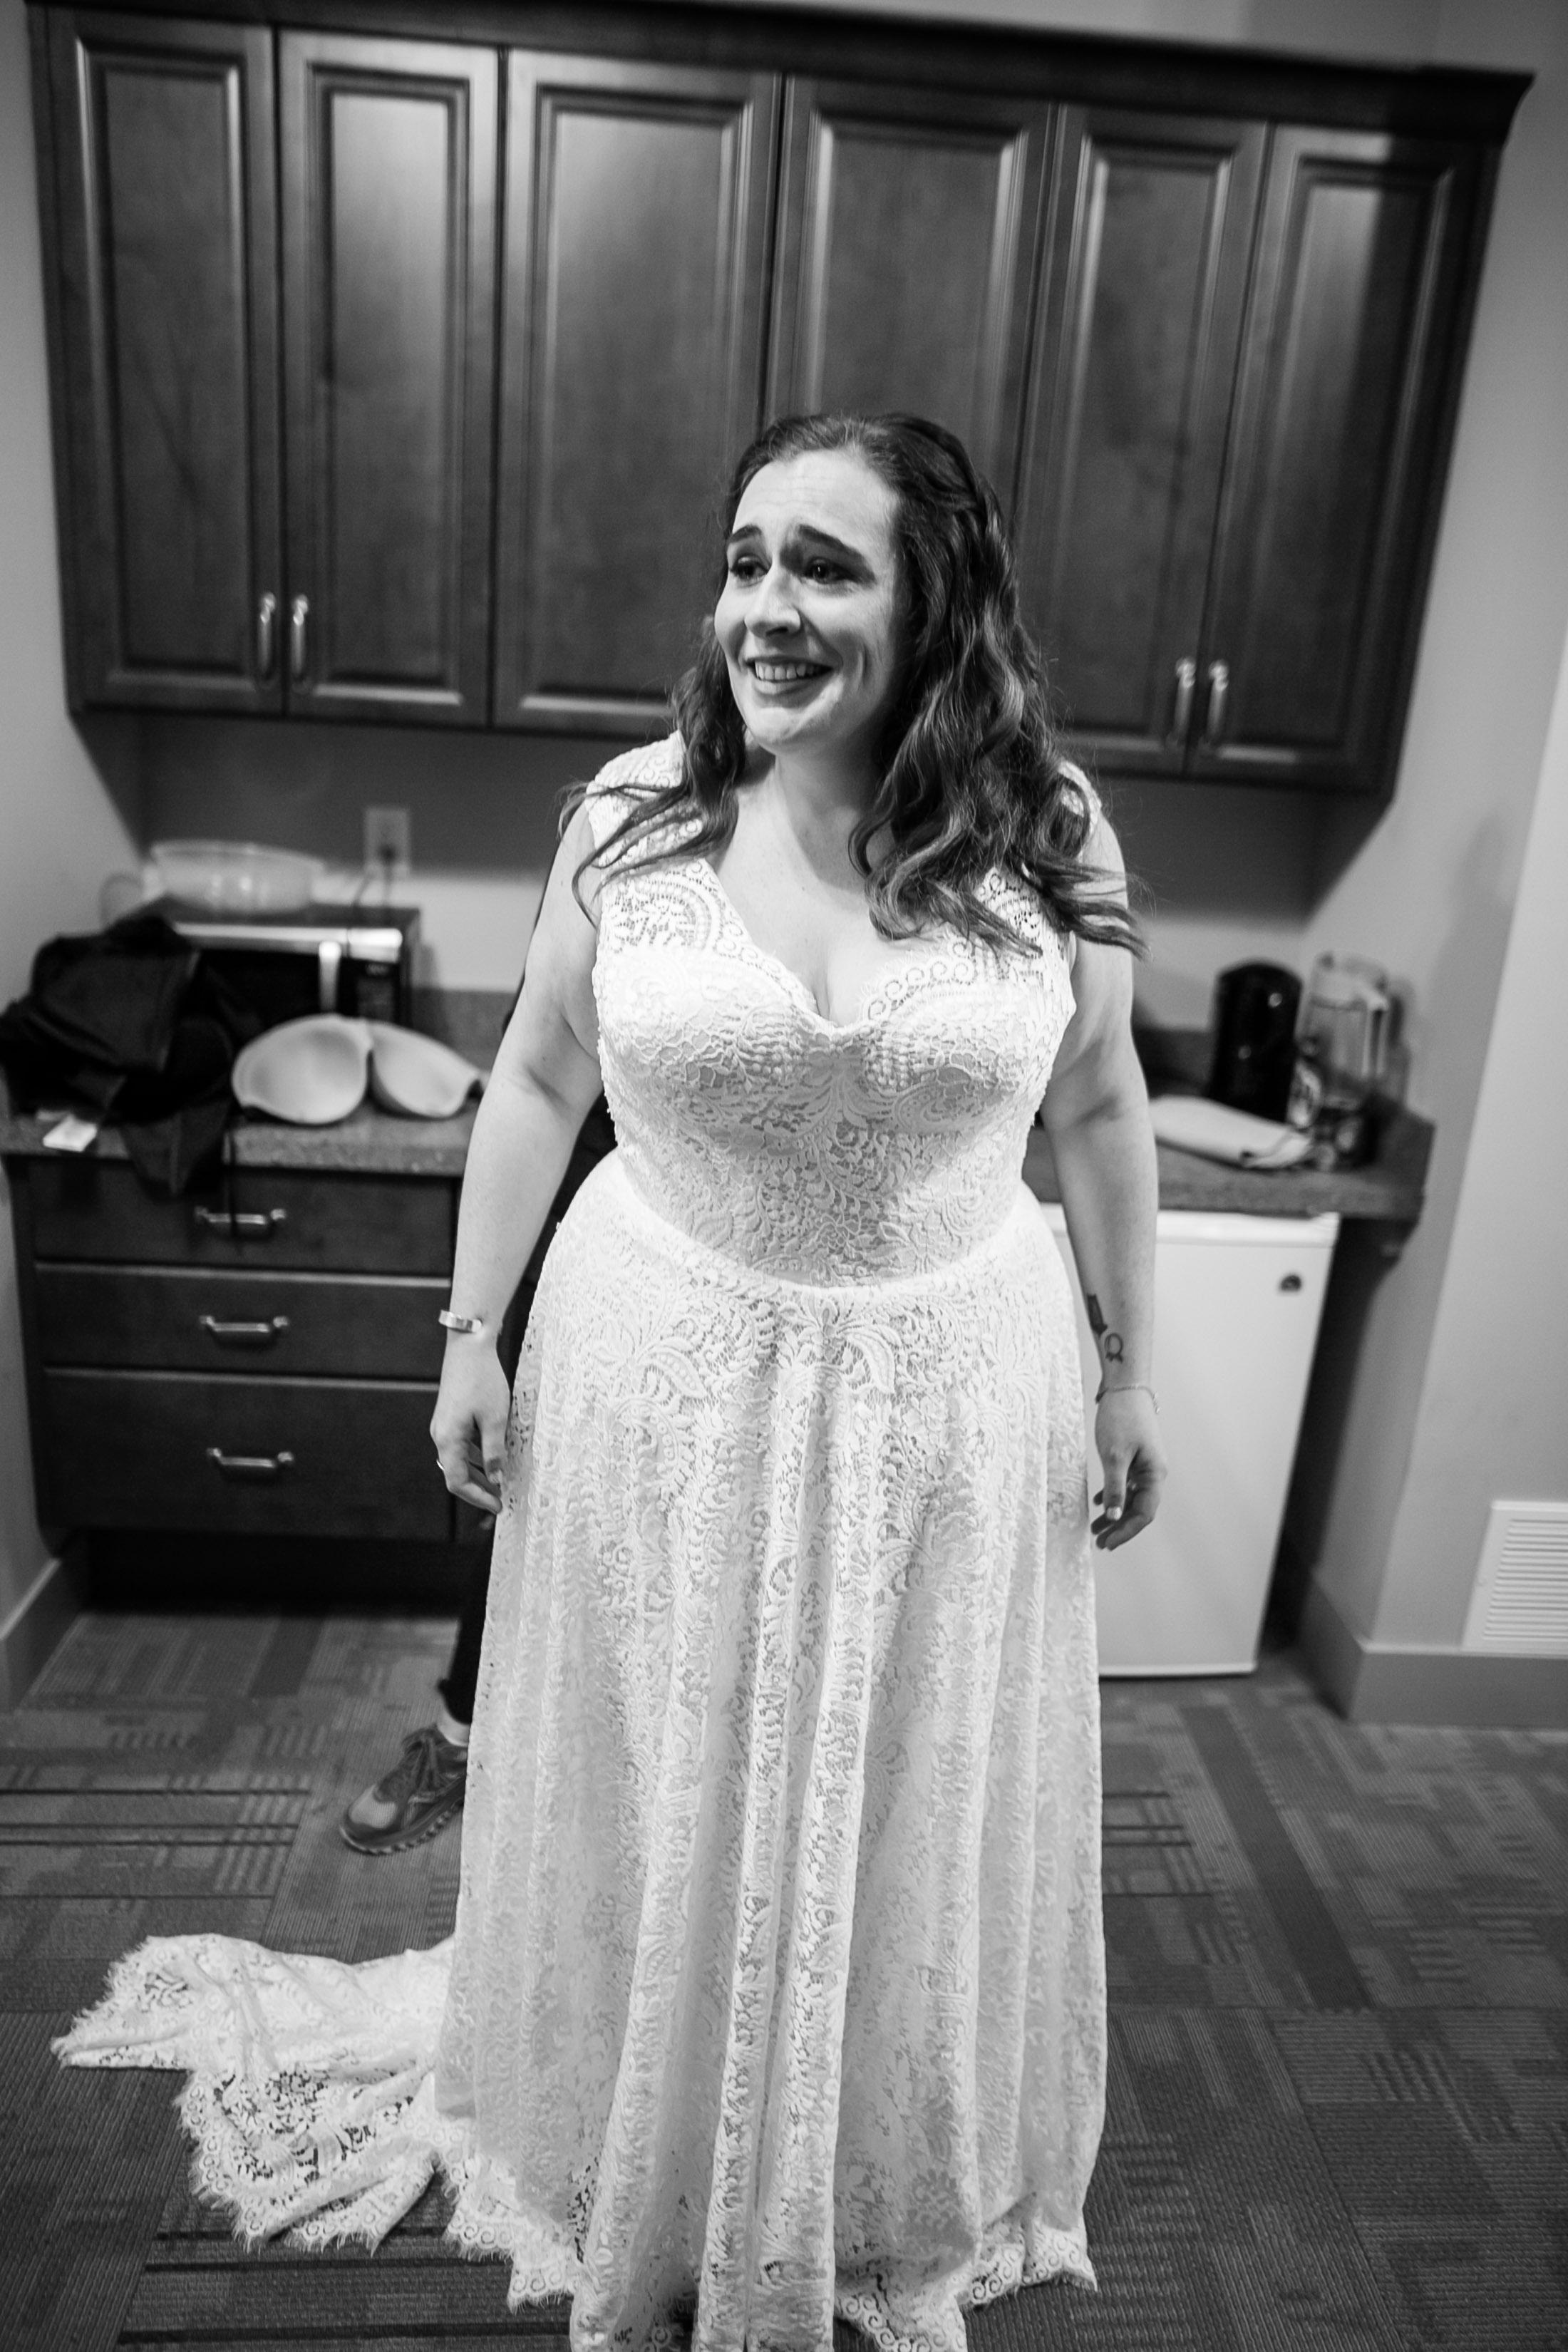 LGBTQ Philadelphia Wedding by Swiger Photography the Lesbian photographer 9